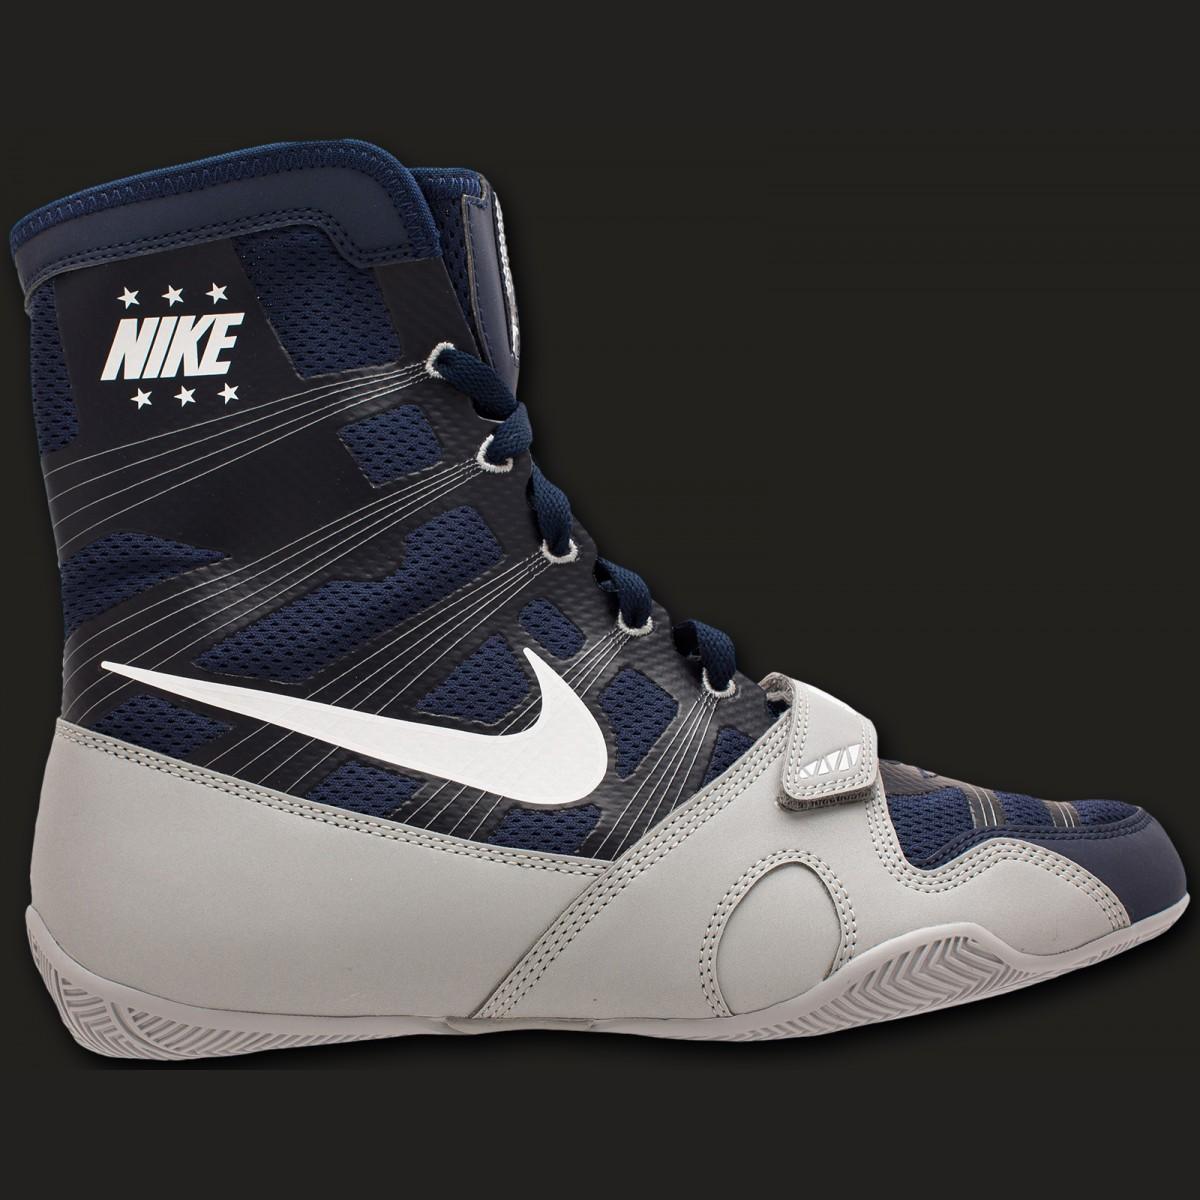 Nike Hyper Ko Boxingboot   PAFFEN SPORT